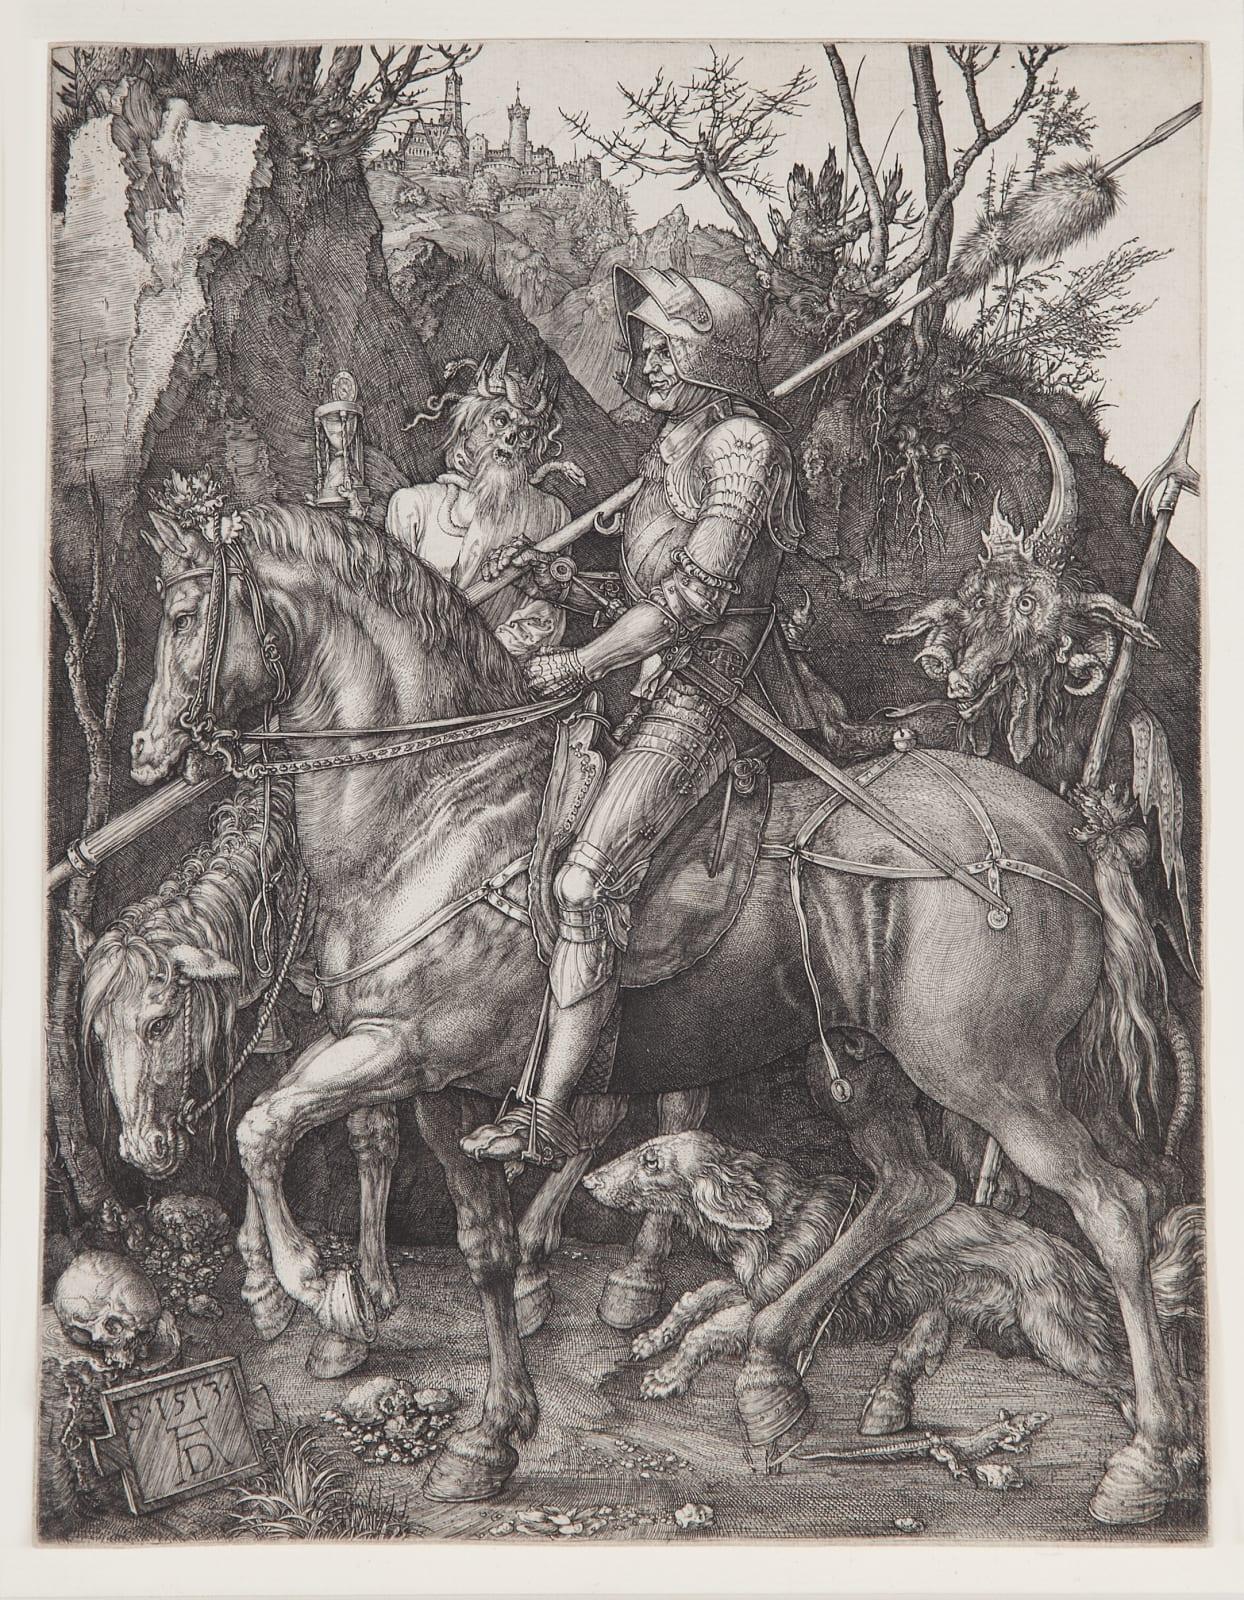 Albrecht Dürer, Knight, Death and the Devil, 1513 Engraving